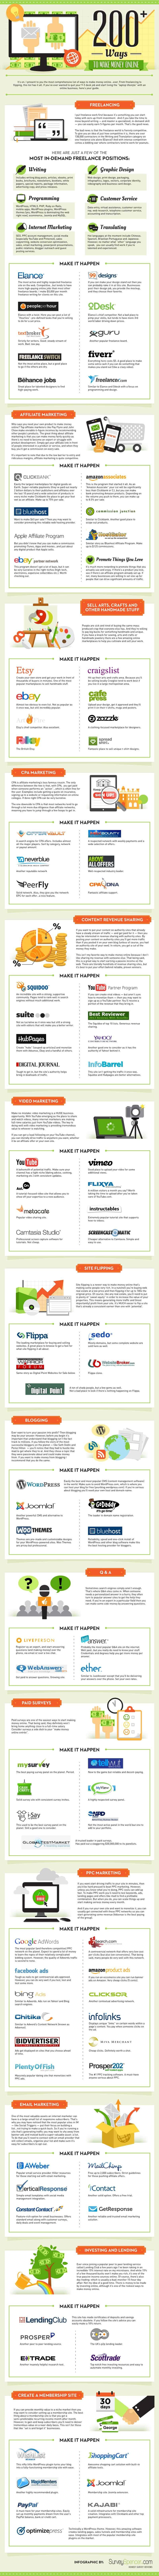 200 Ways to Make Money Online [Infographic]